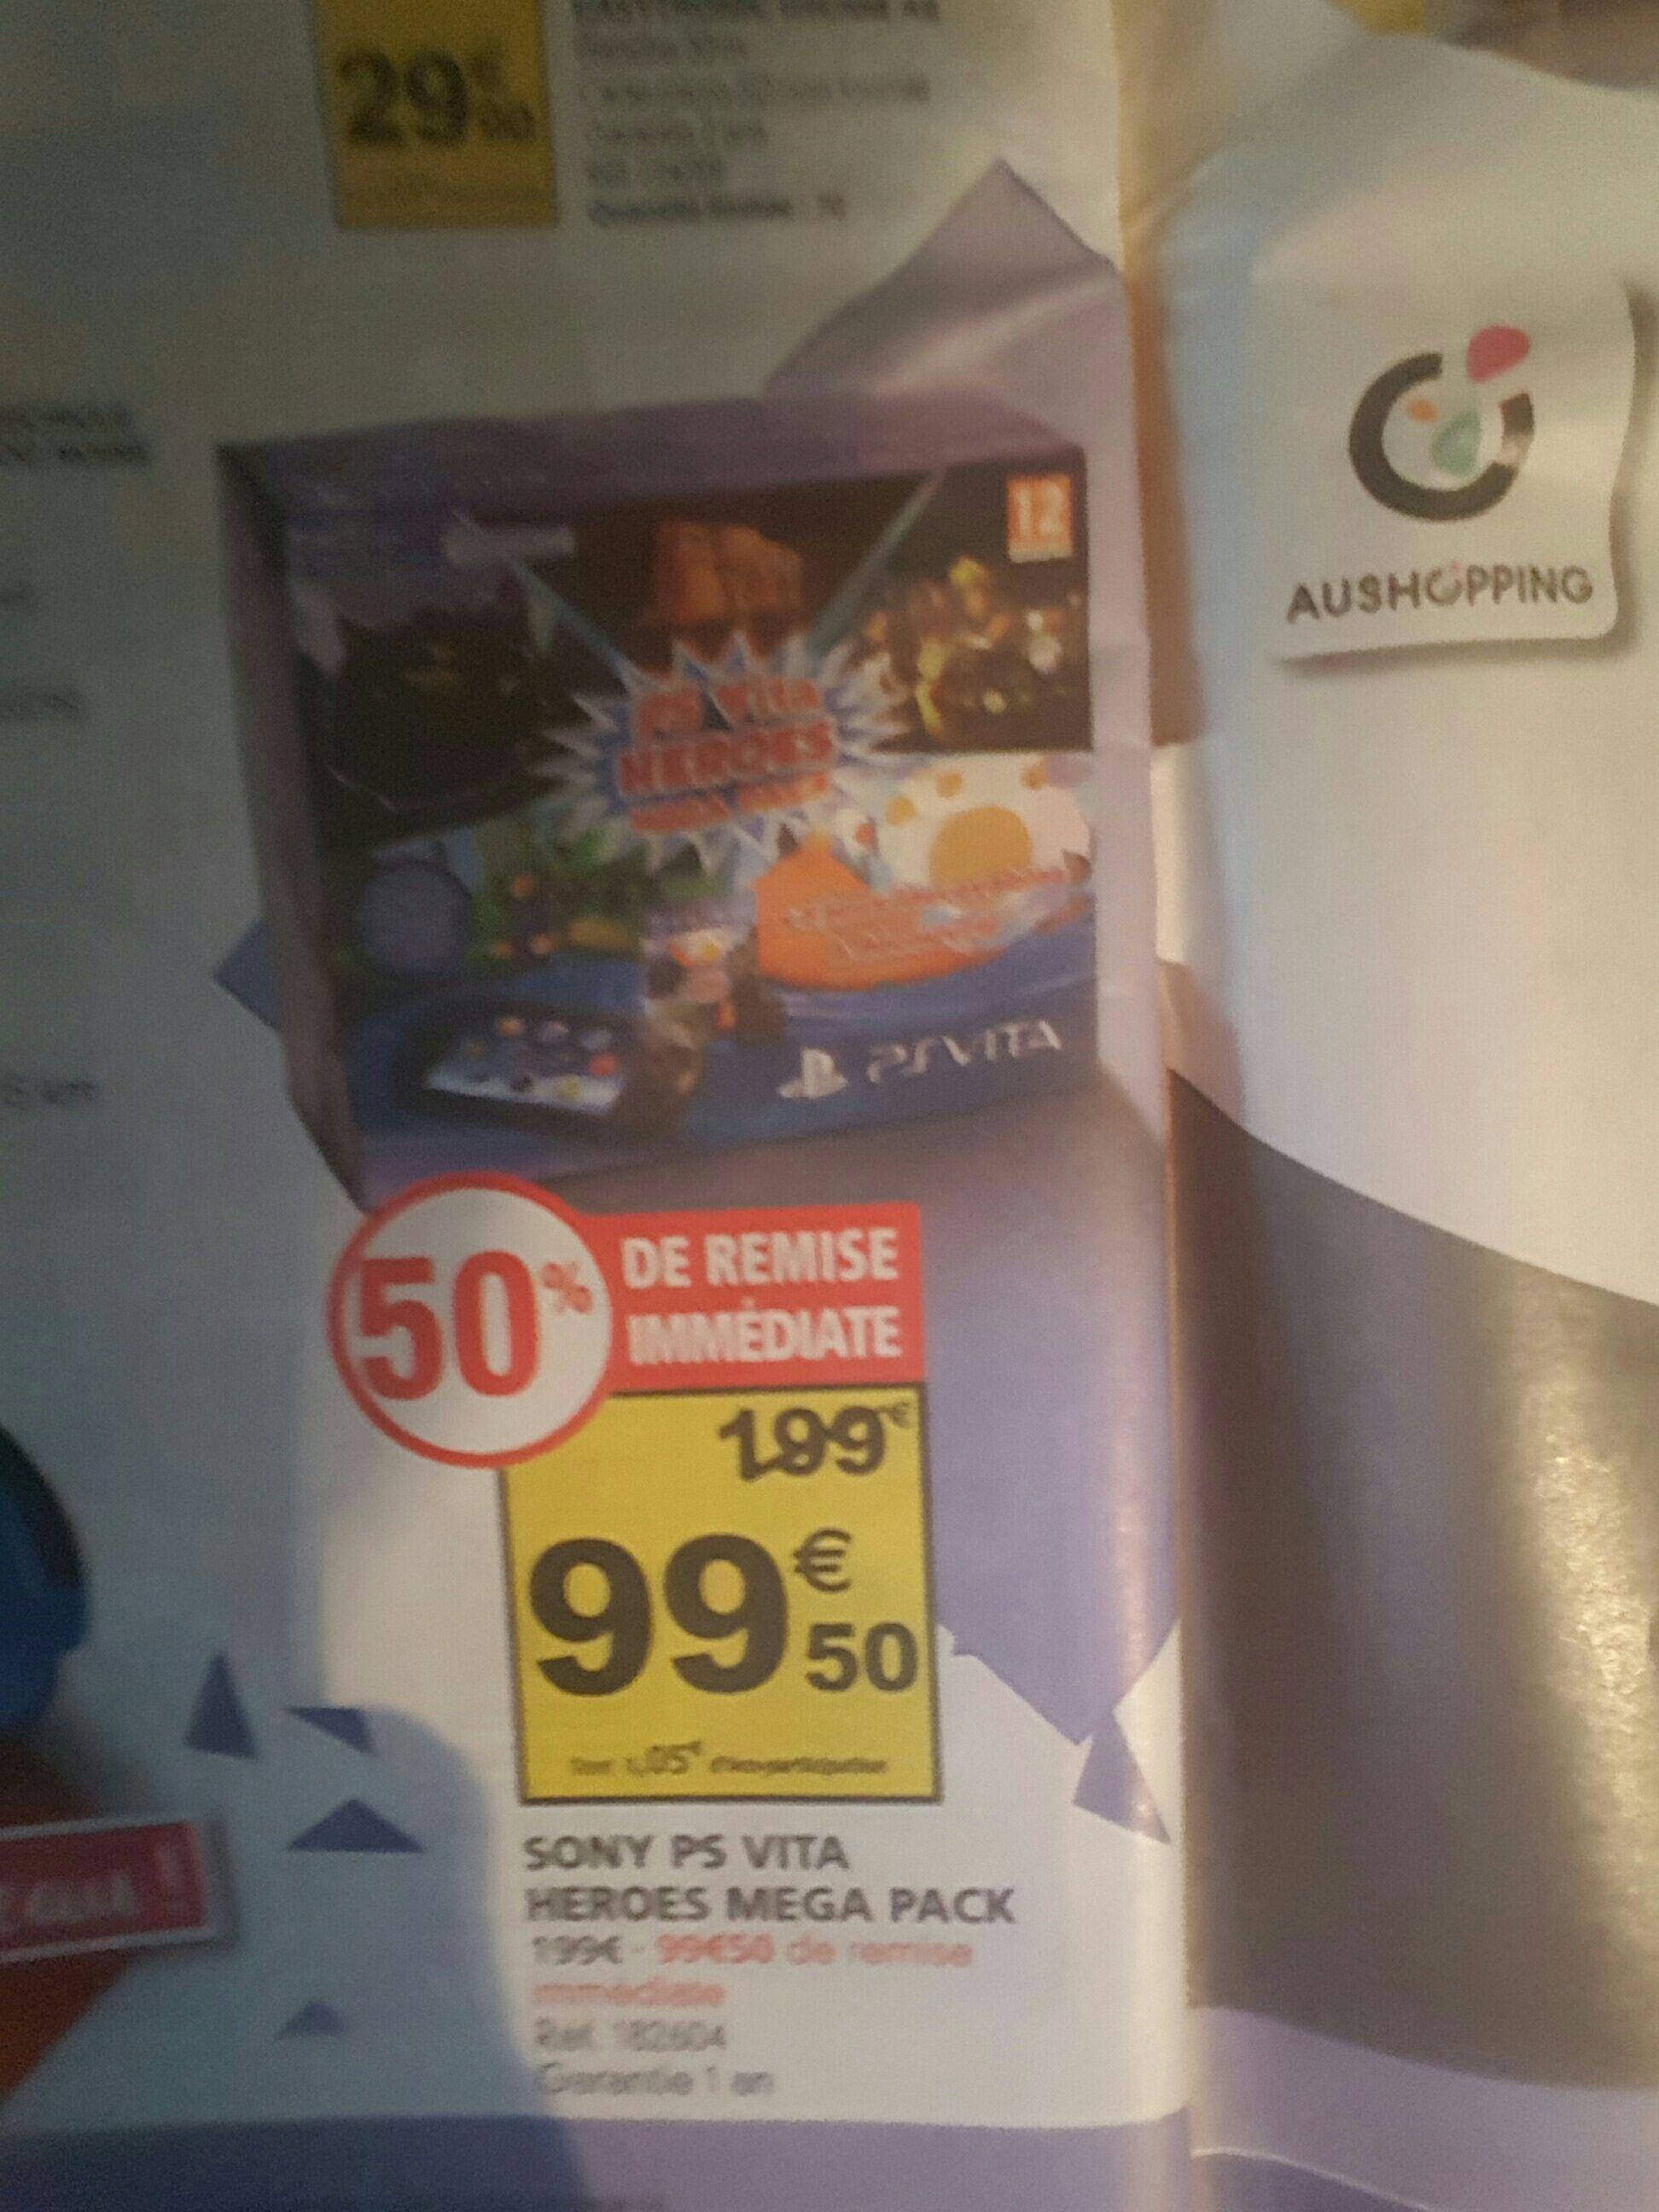 Selections de consoles portables en promotion - Ex : Console Sony PS Vita Heroes Mega Pack